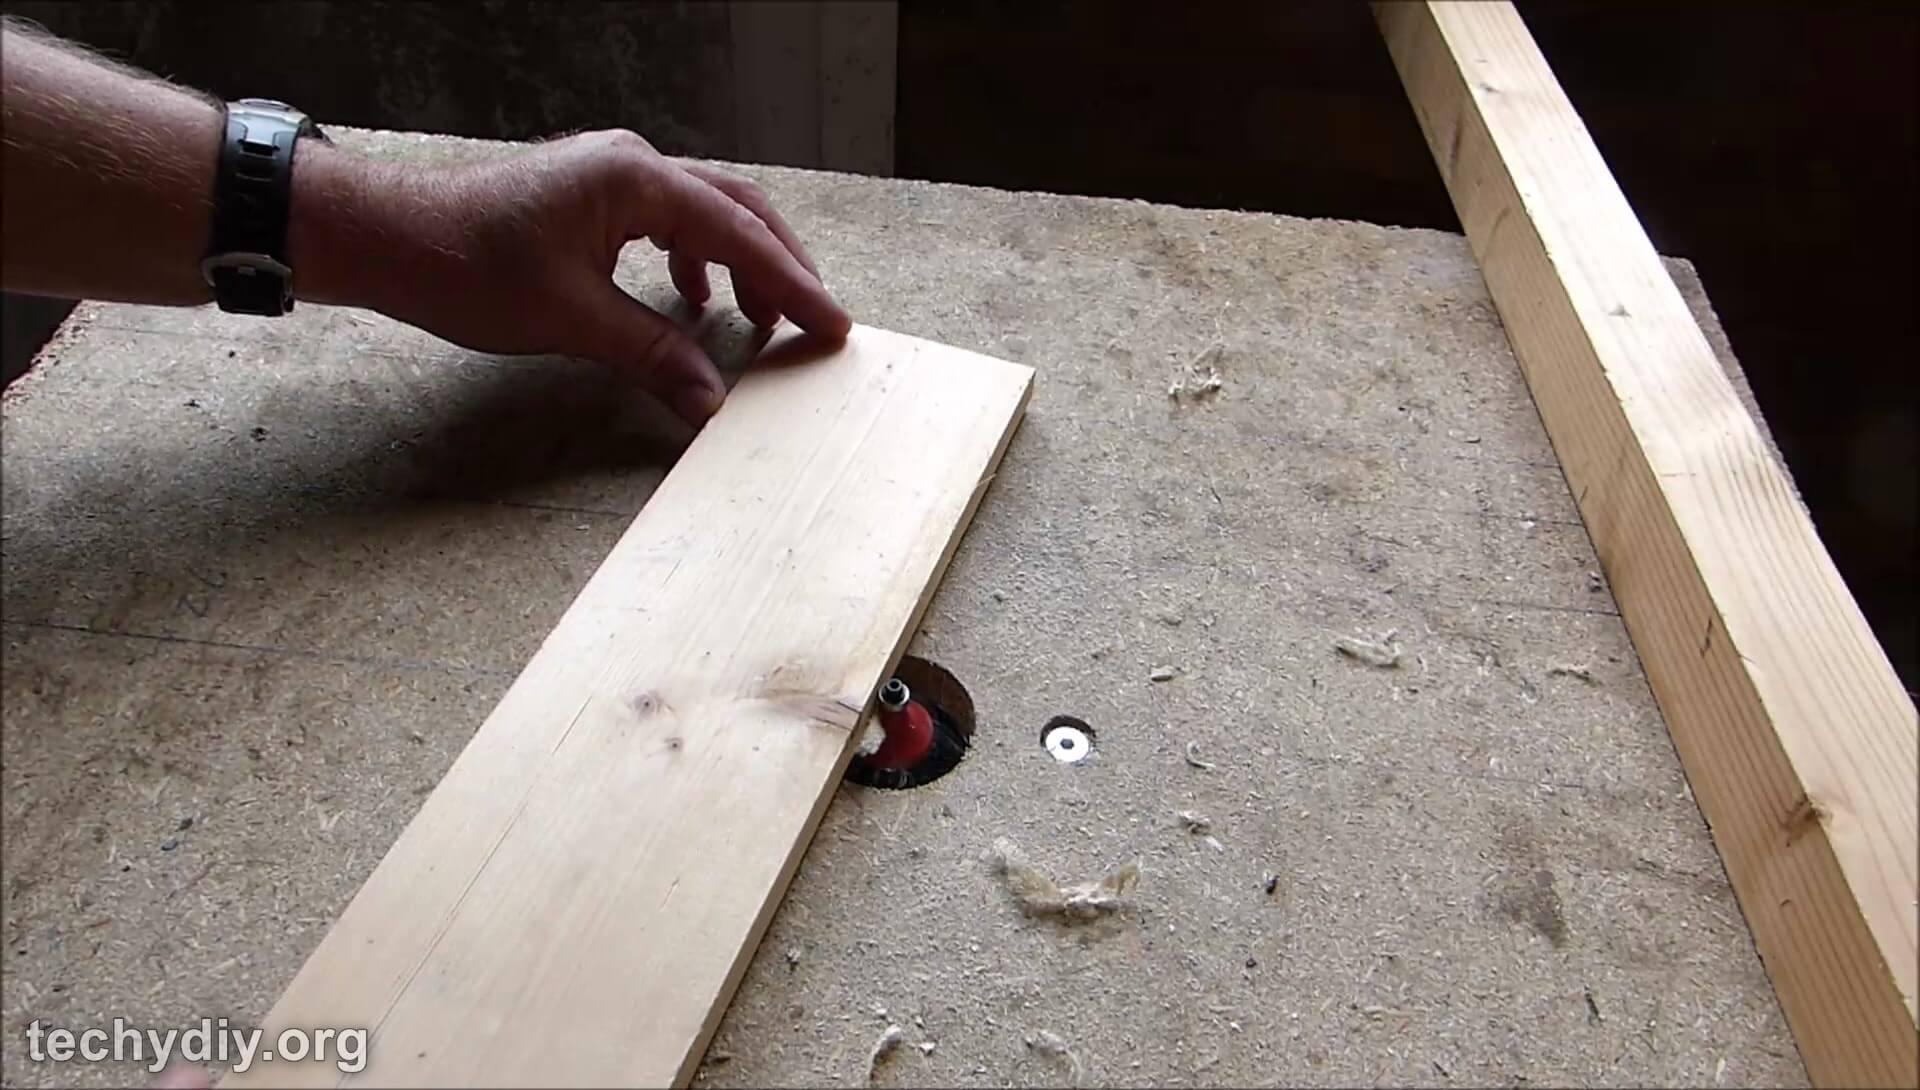 How to make an XMEN led edge lit sign mirror | Techydiy